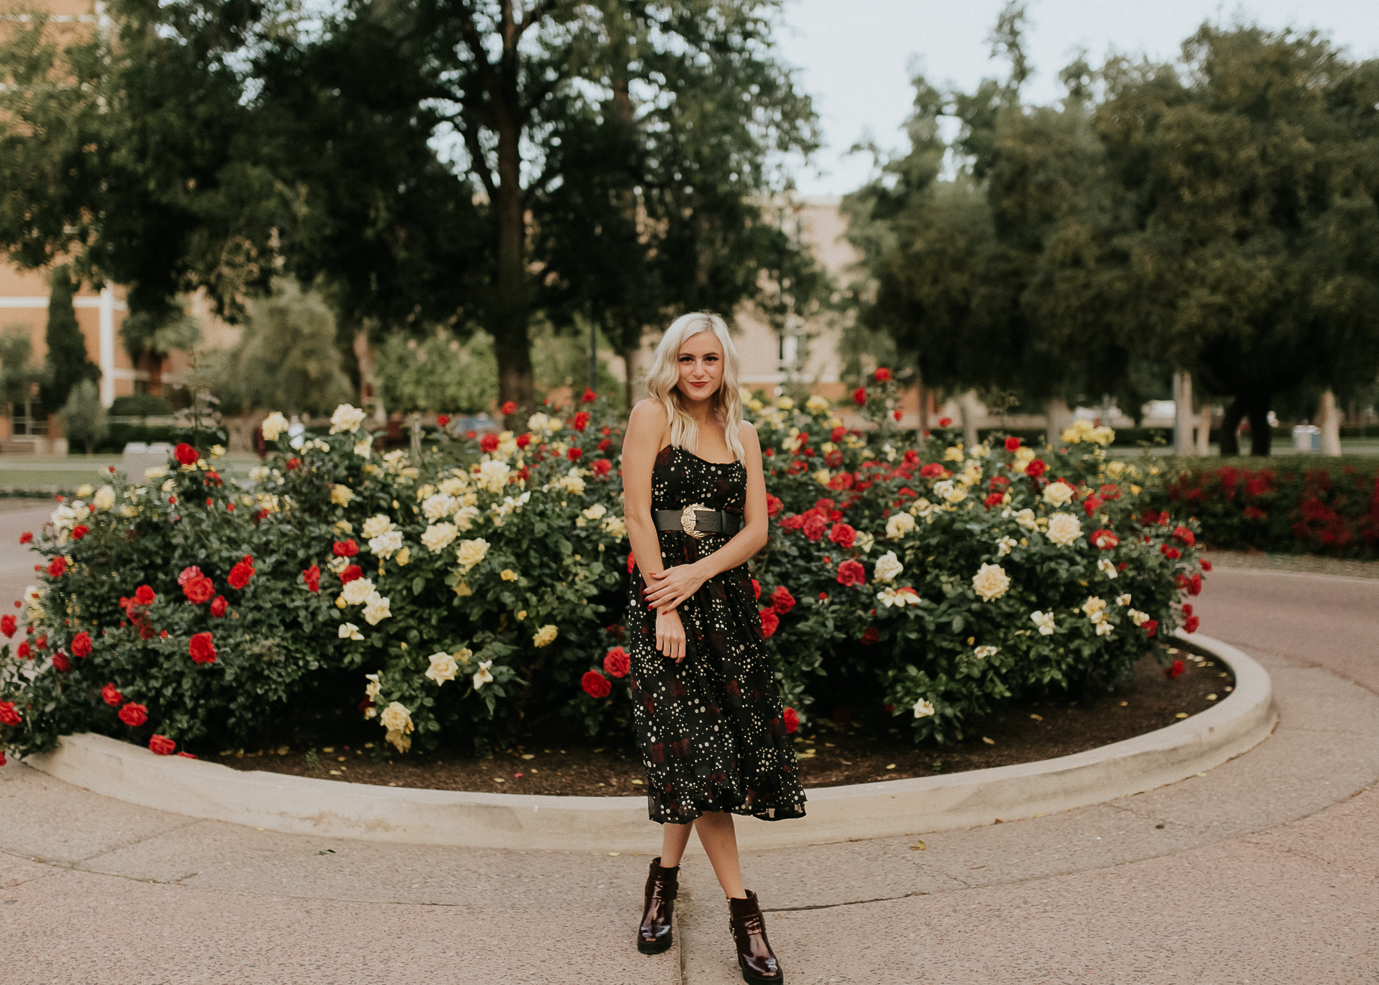 Megan Claire Photography | Phoenix Arizona Wedding and Engagement Photographer. Arizona State University grad photoshoot. College Graduation photos at Old Main ASU @meganclairephoto